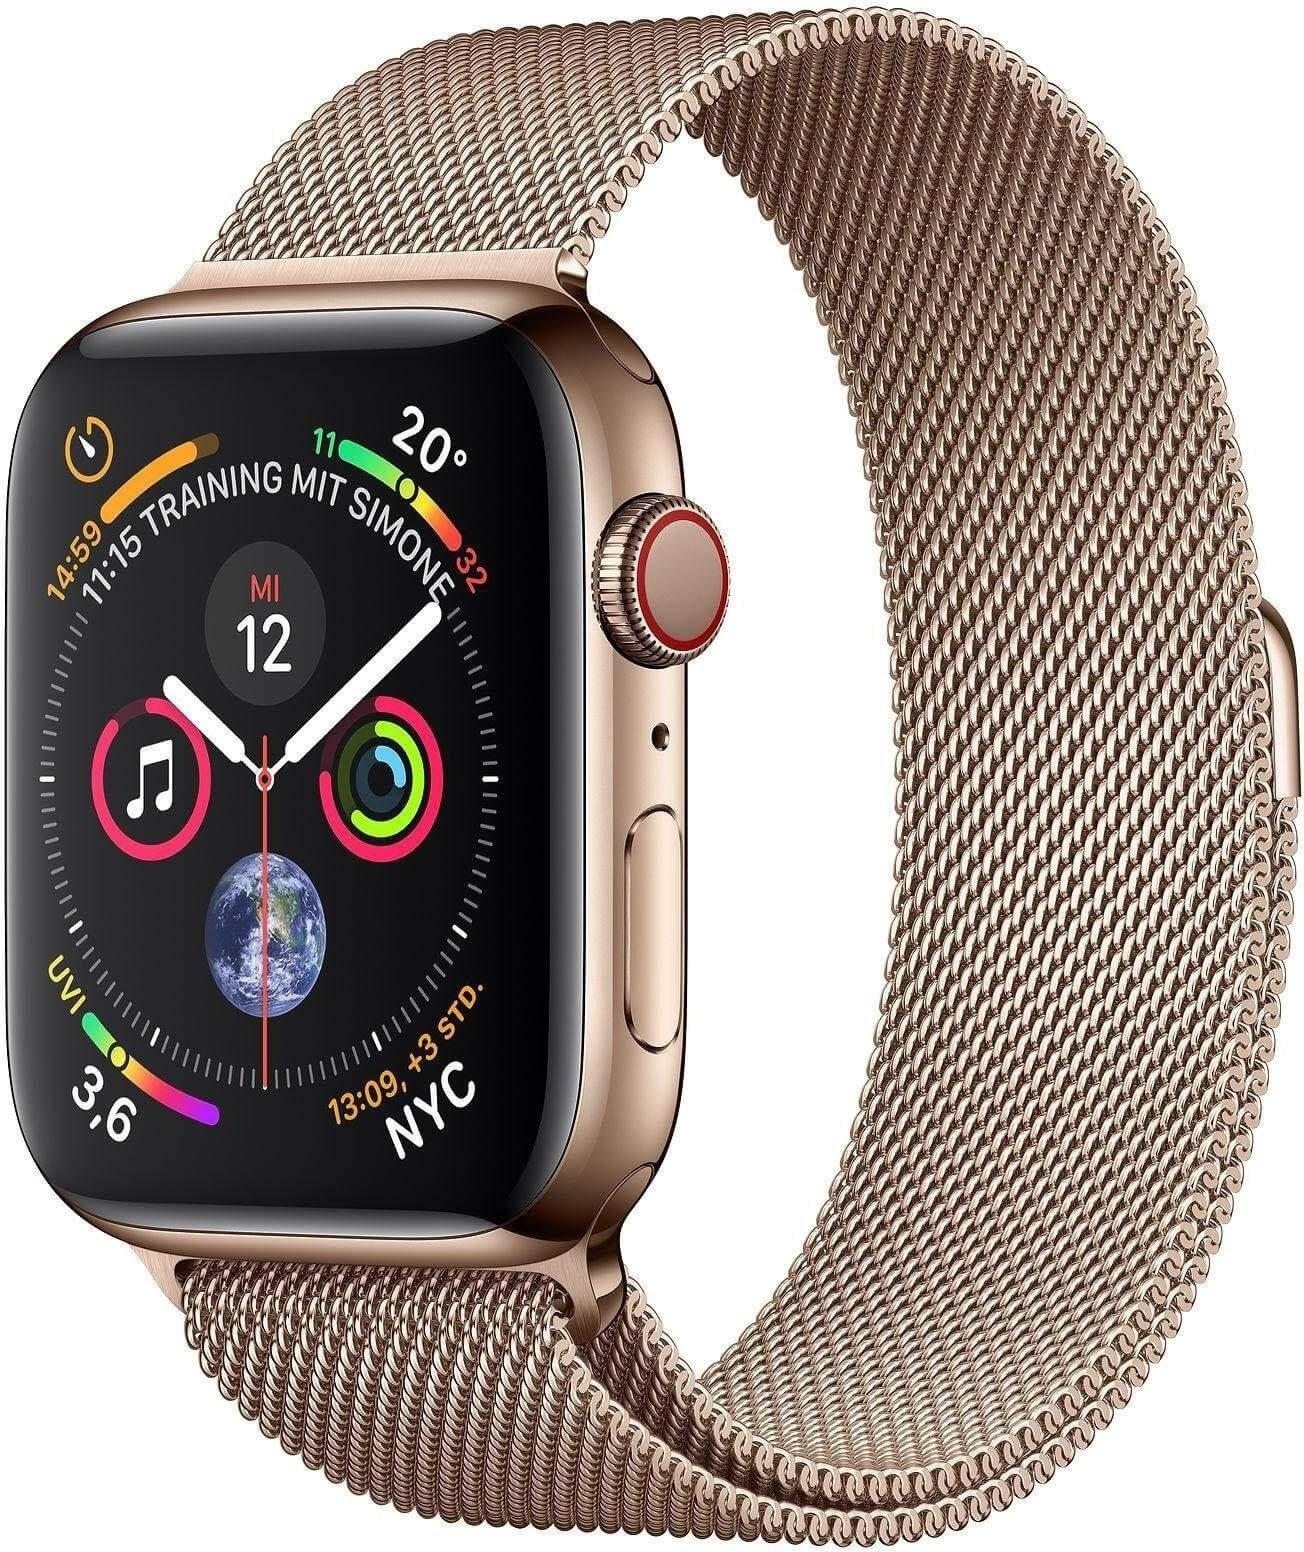 تصویر ساعت هوشمند اپل واچ آمریکا Apple Series 4 GPS -Cellular Edelstahlgehäuse mit Milanaise Armband 44mm Watch Watch OS 5